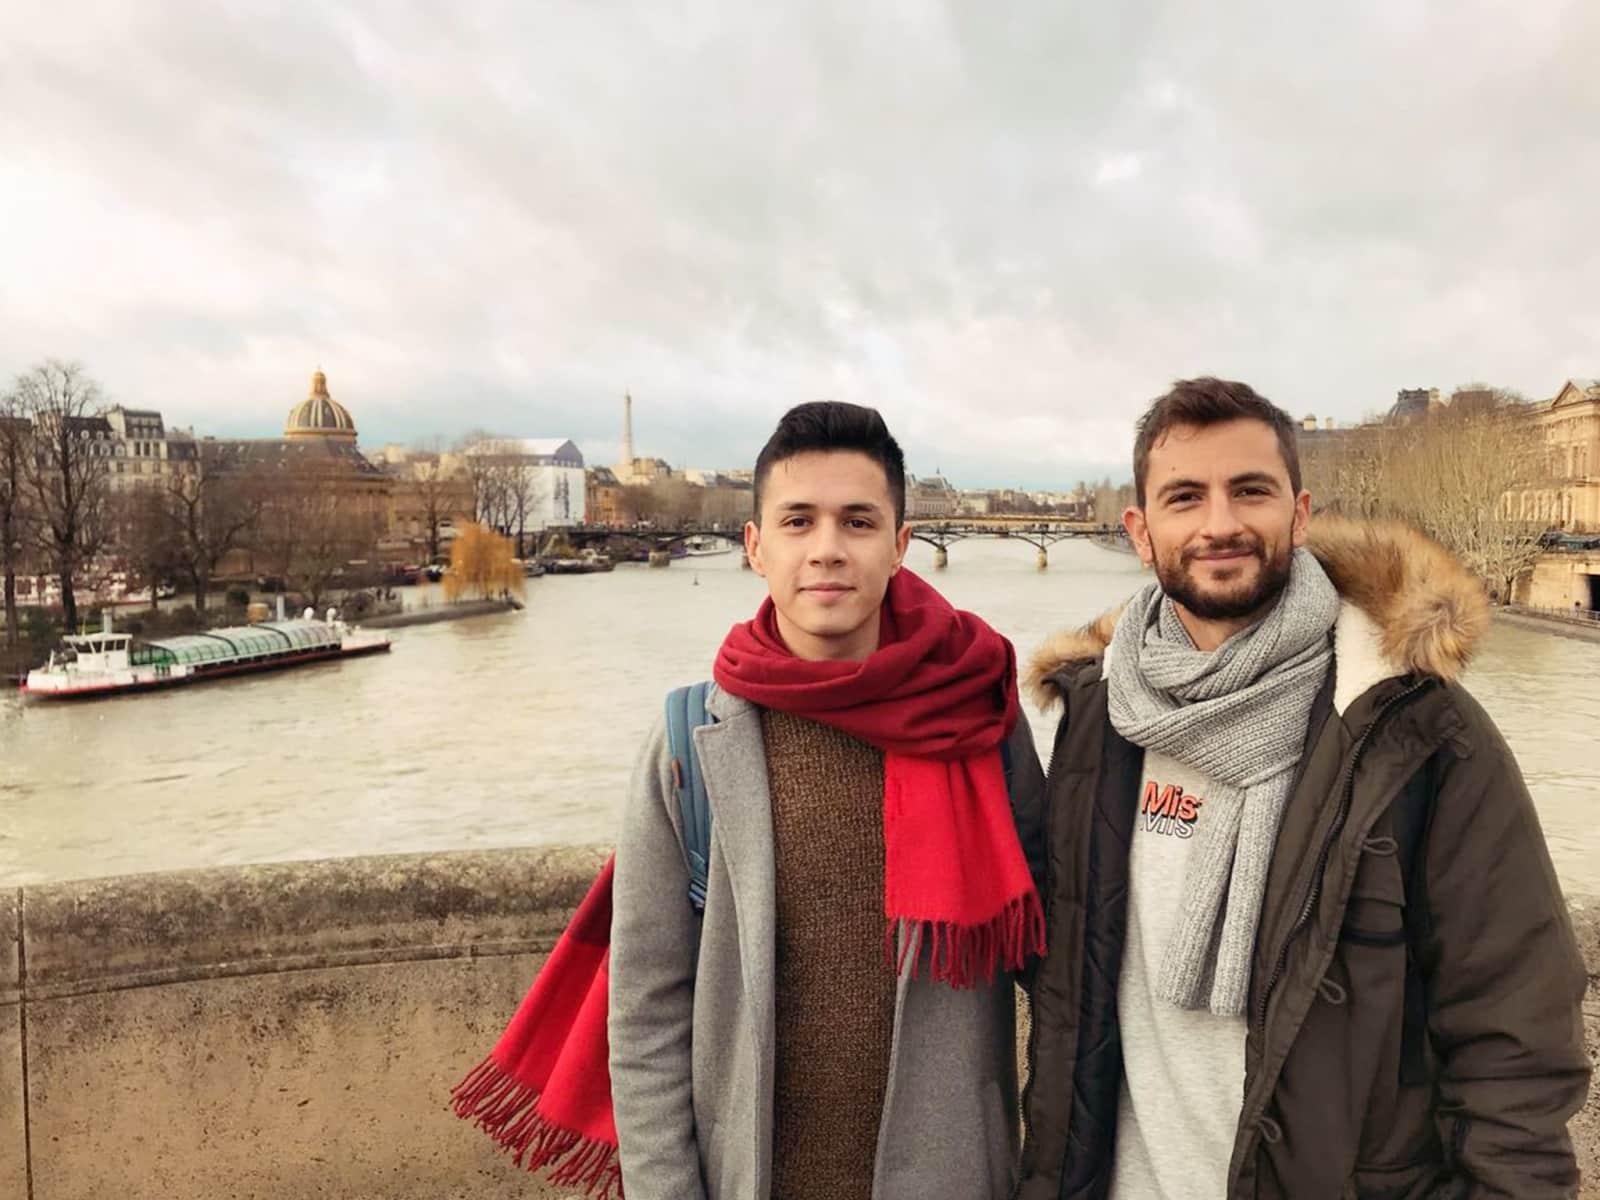 Ramiro & Lucas martin from Pergamino, Argentina